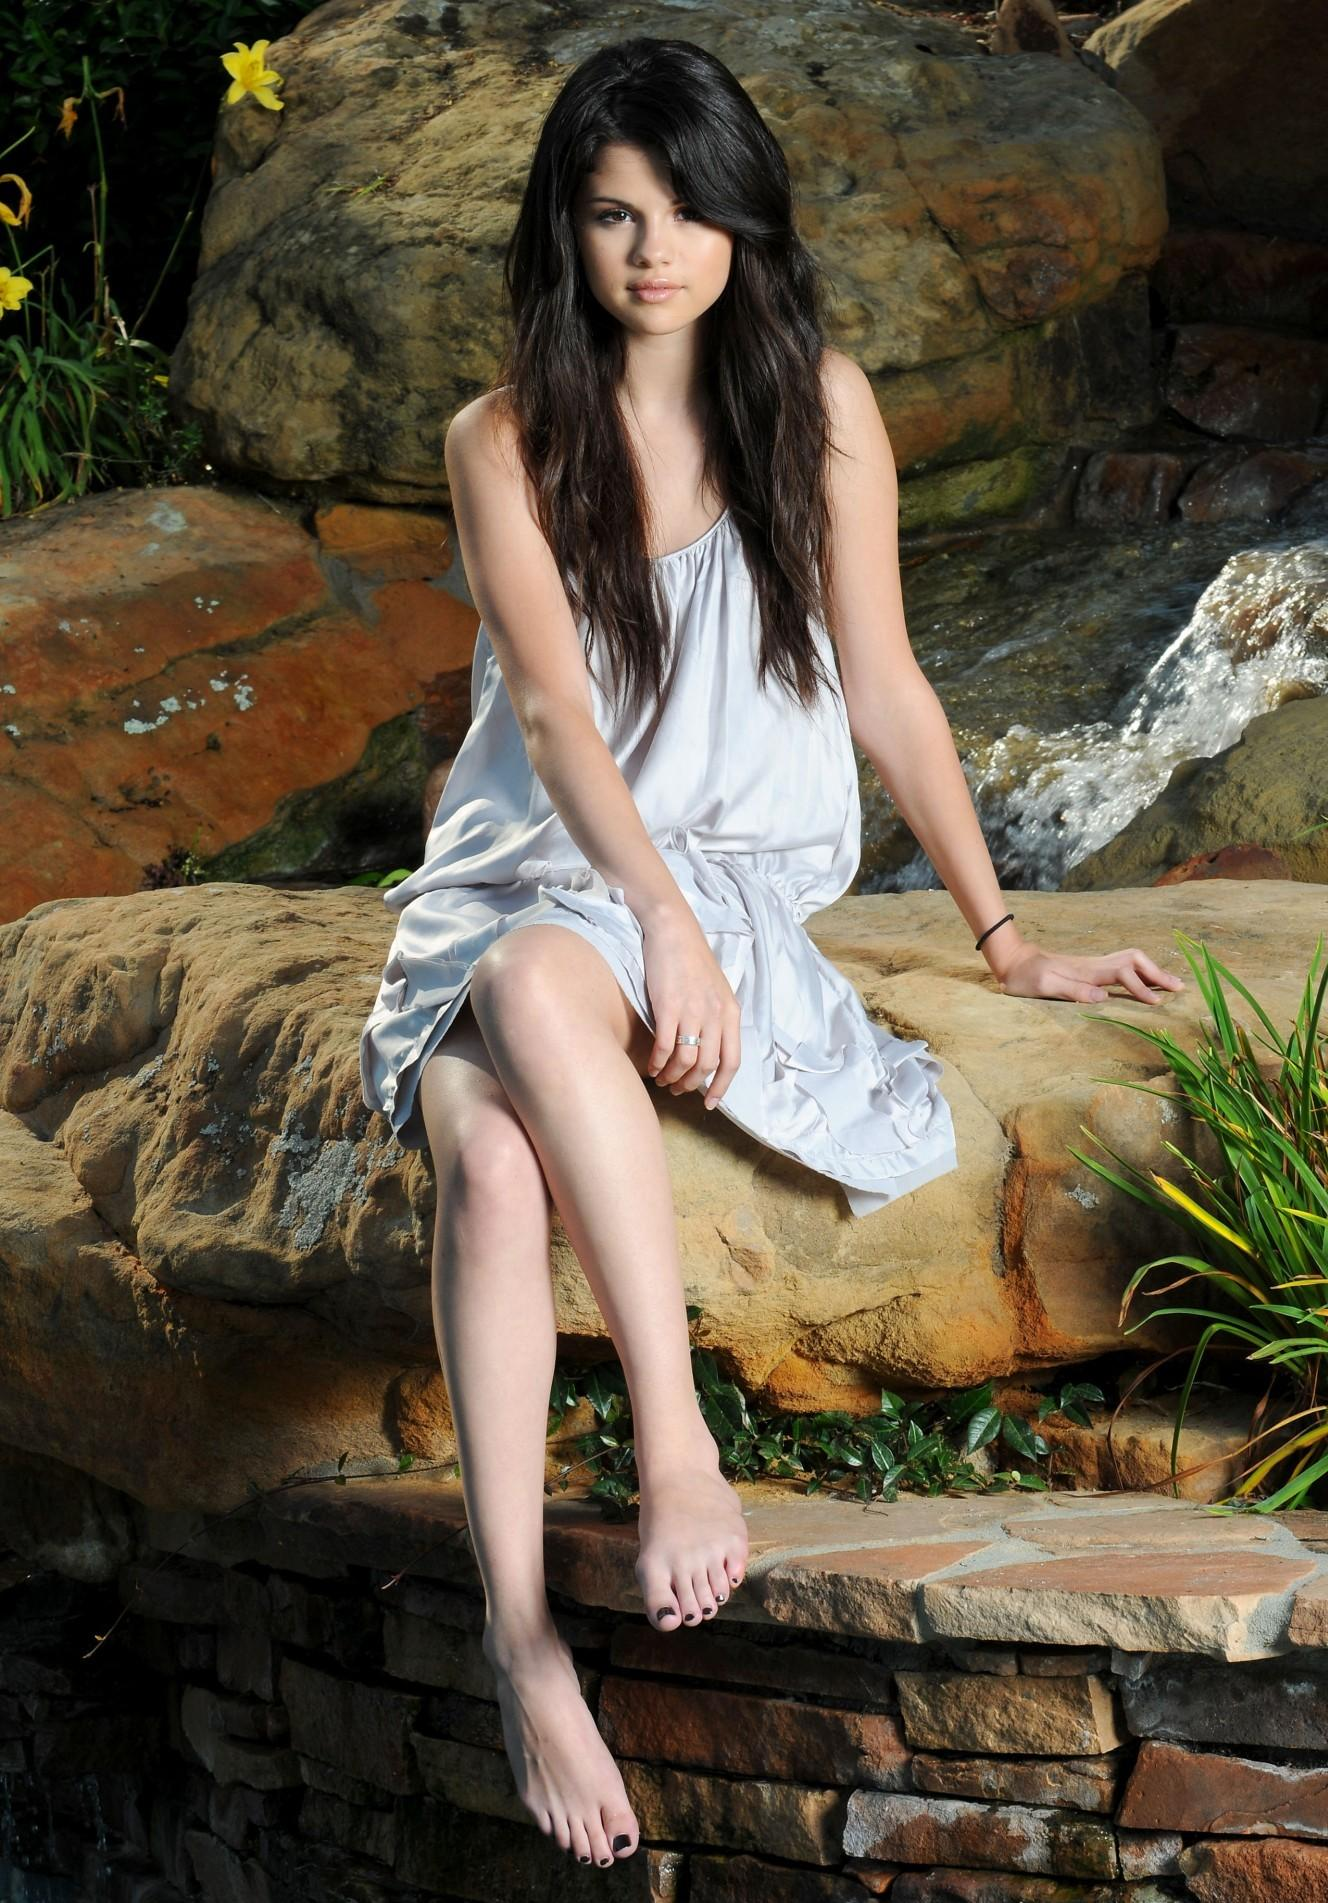 1000 Images About Selena Gomez Feet On Pinterest